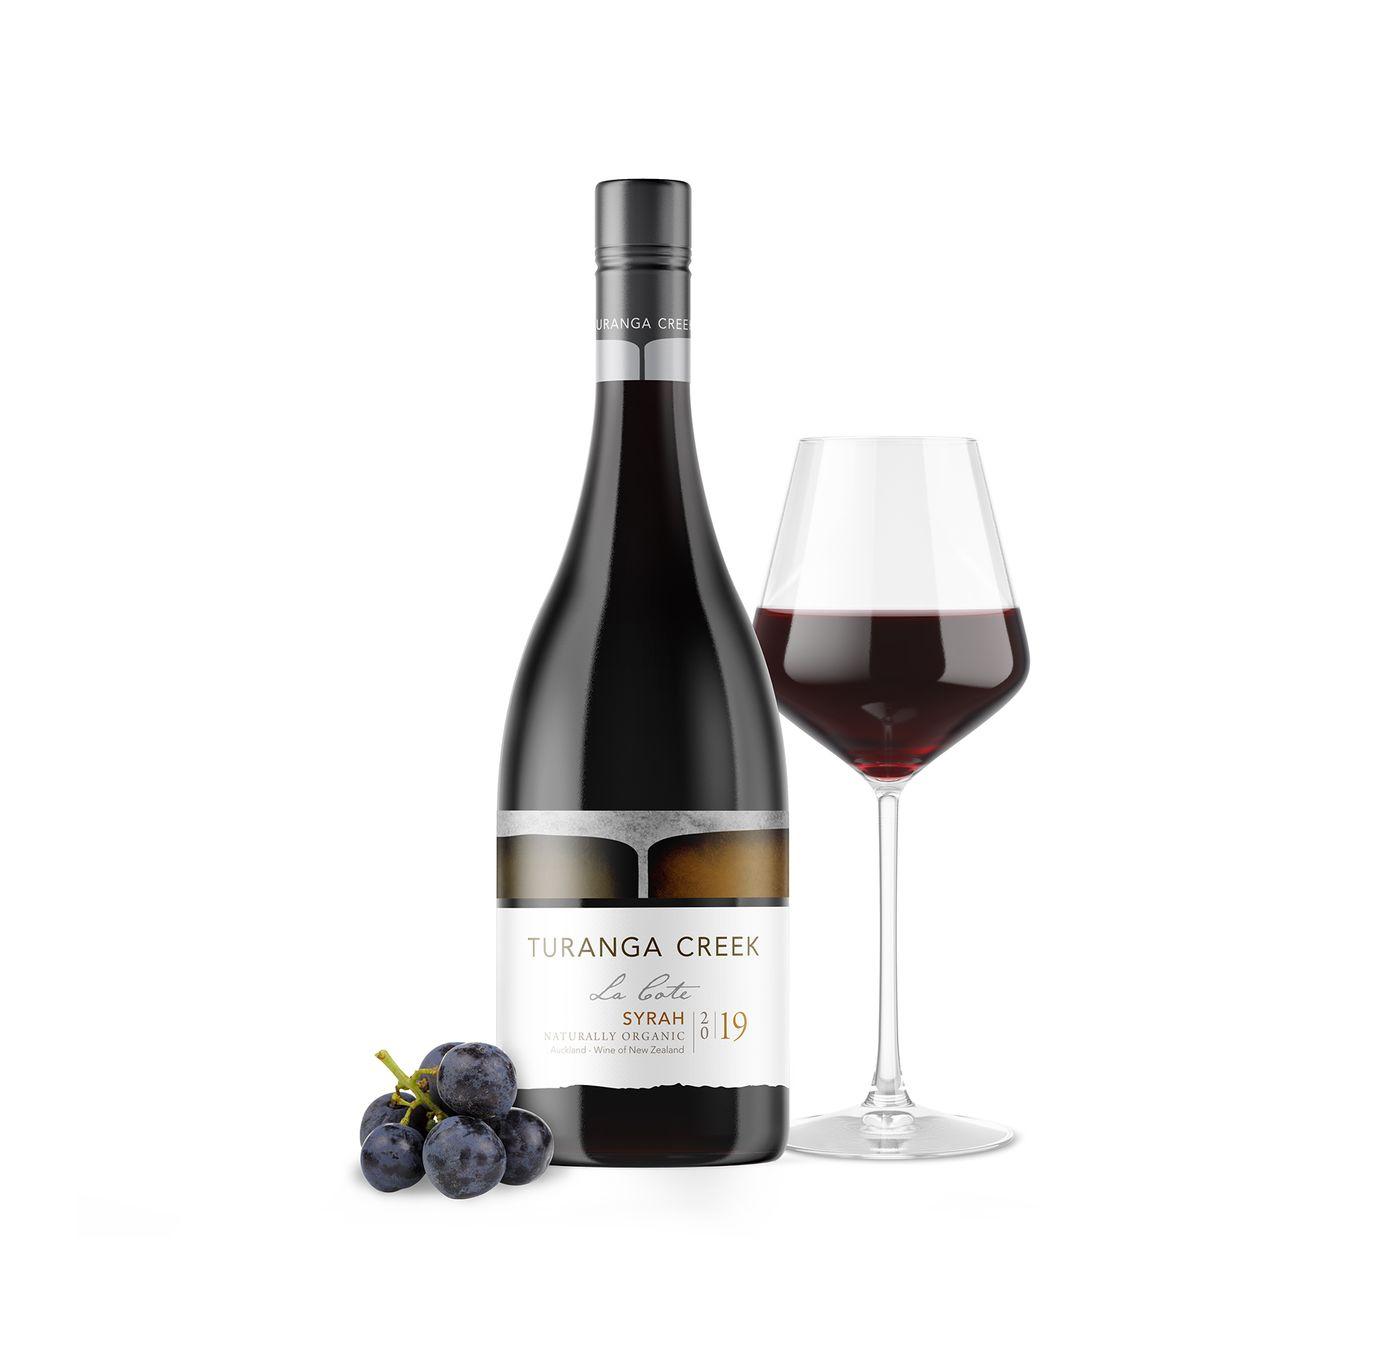 Turanga Creek Wine Reserve Syrah